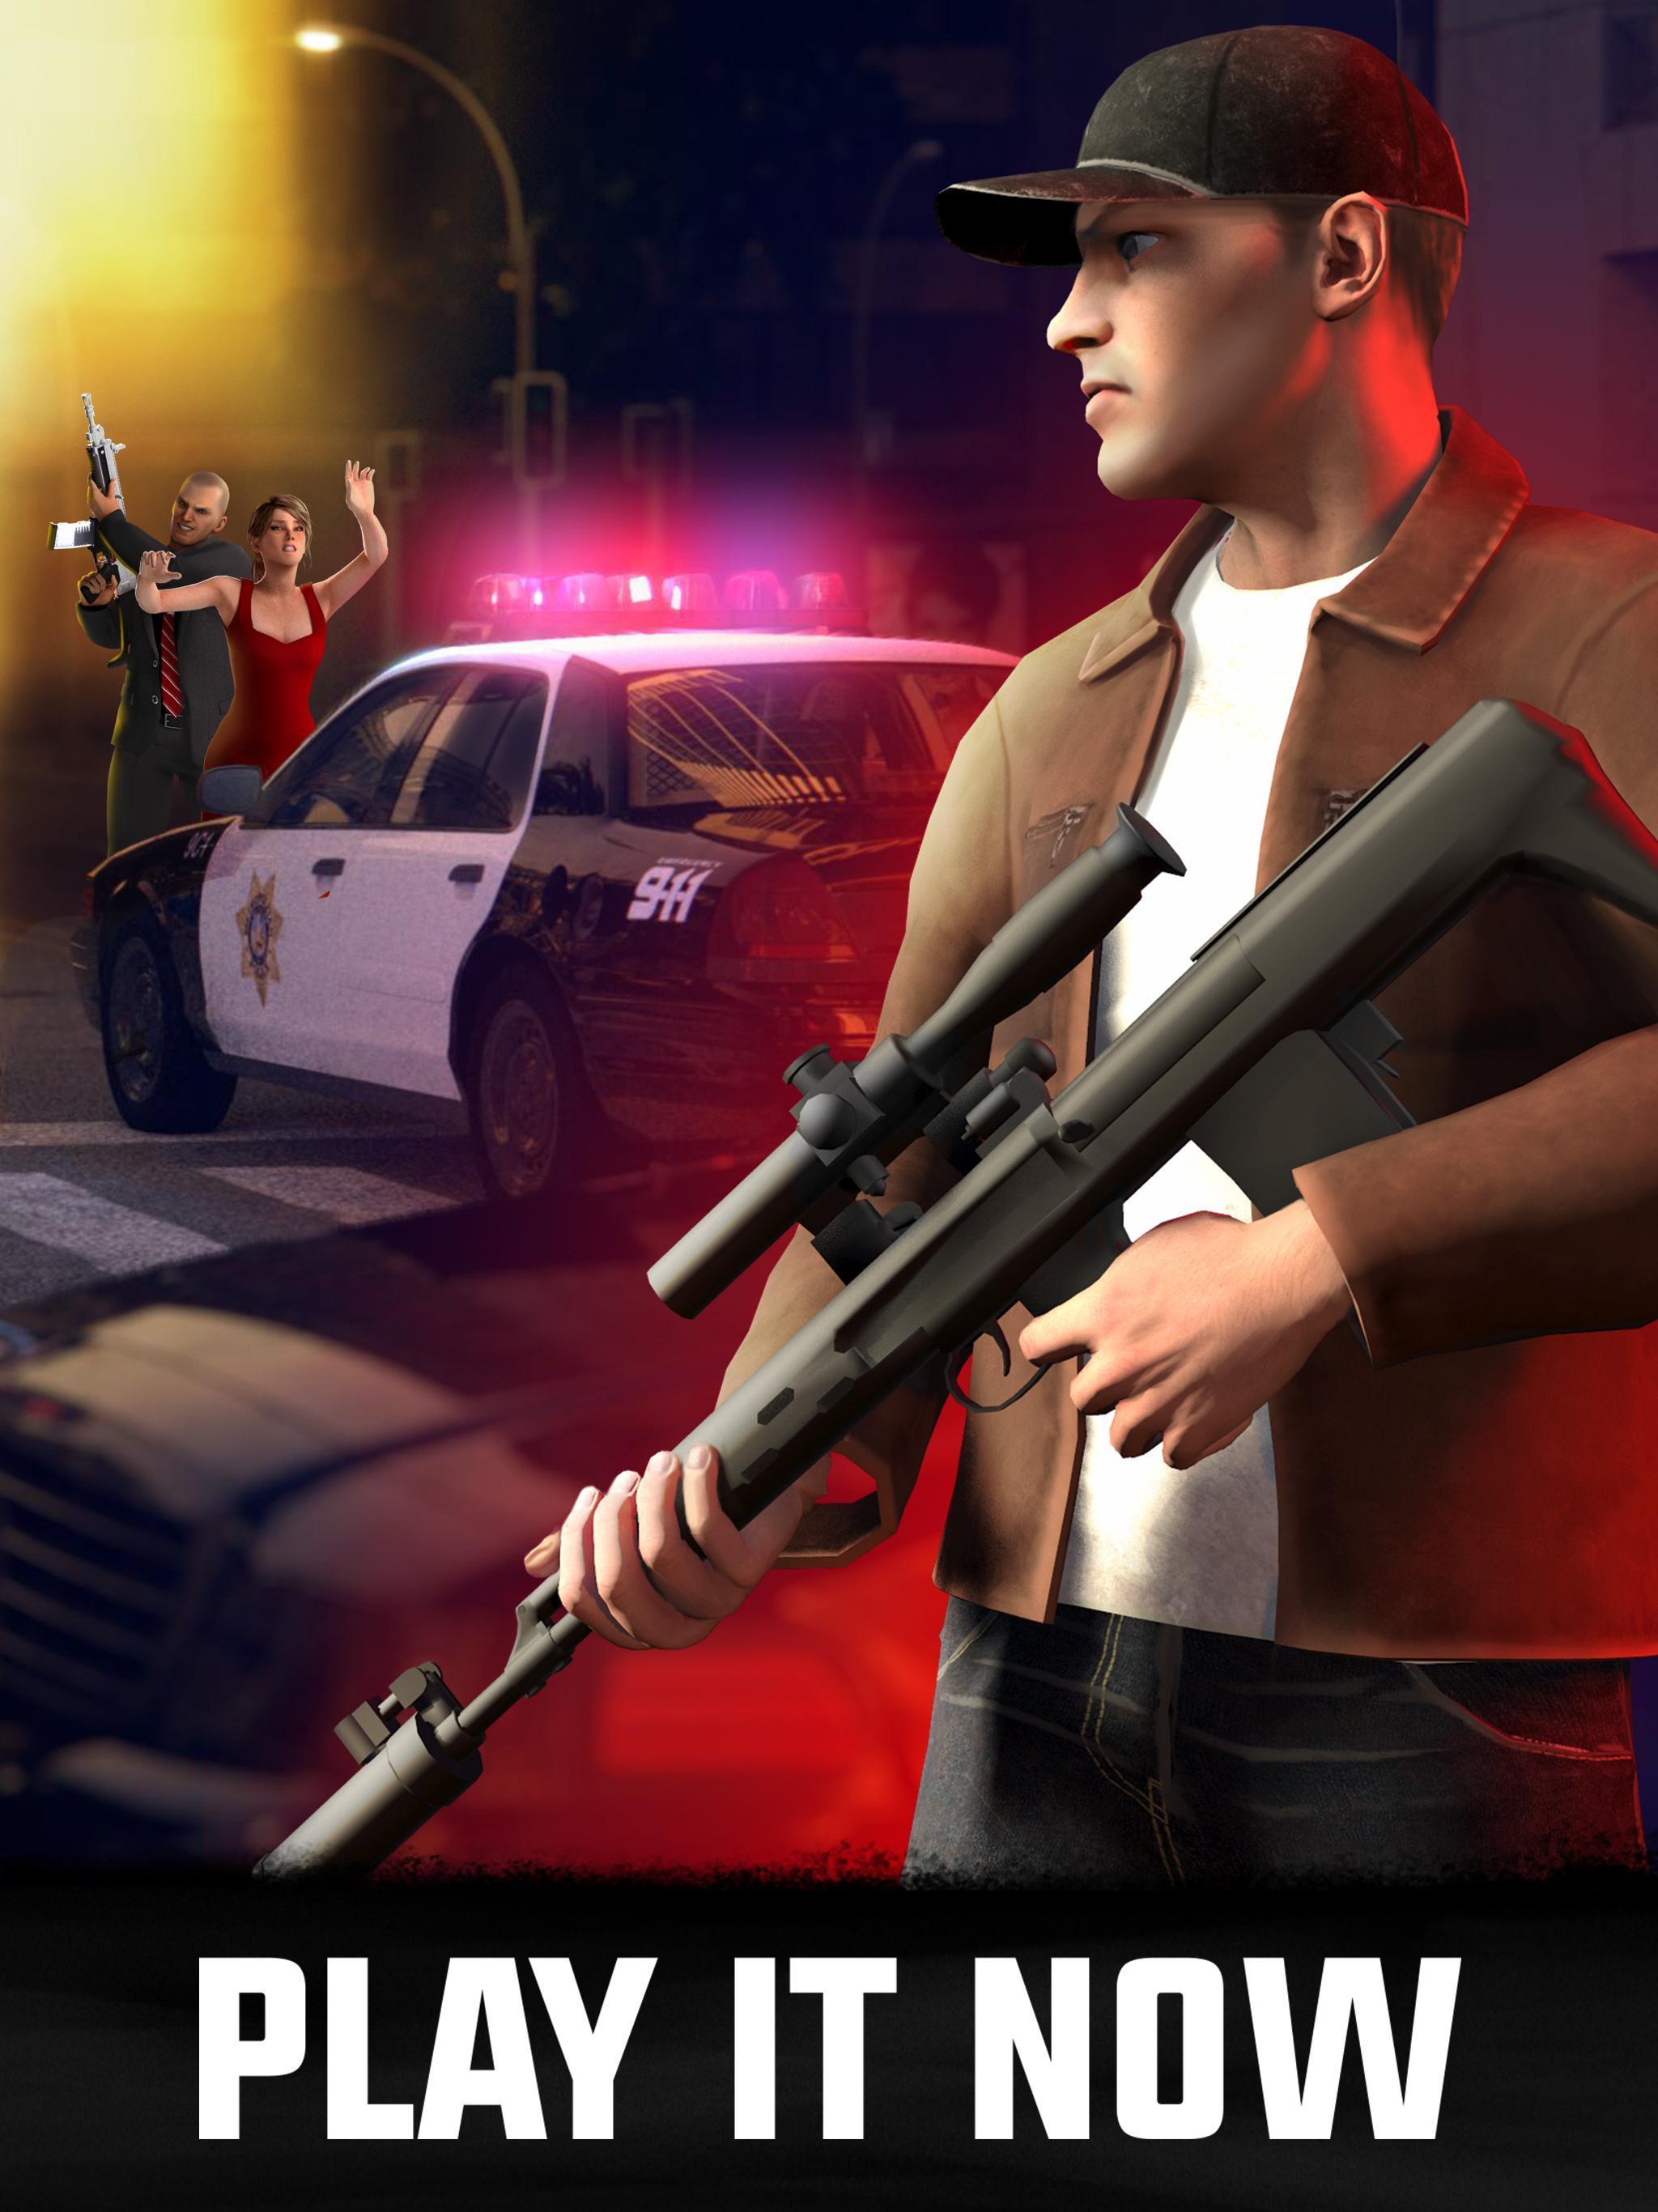 Sniper 3D Fun Free Online FPS Shooting Game 3.15.1 Screenshot 11